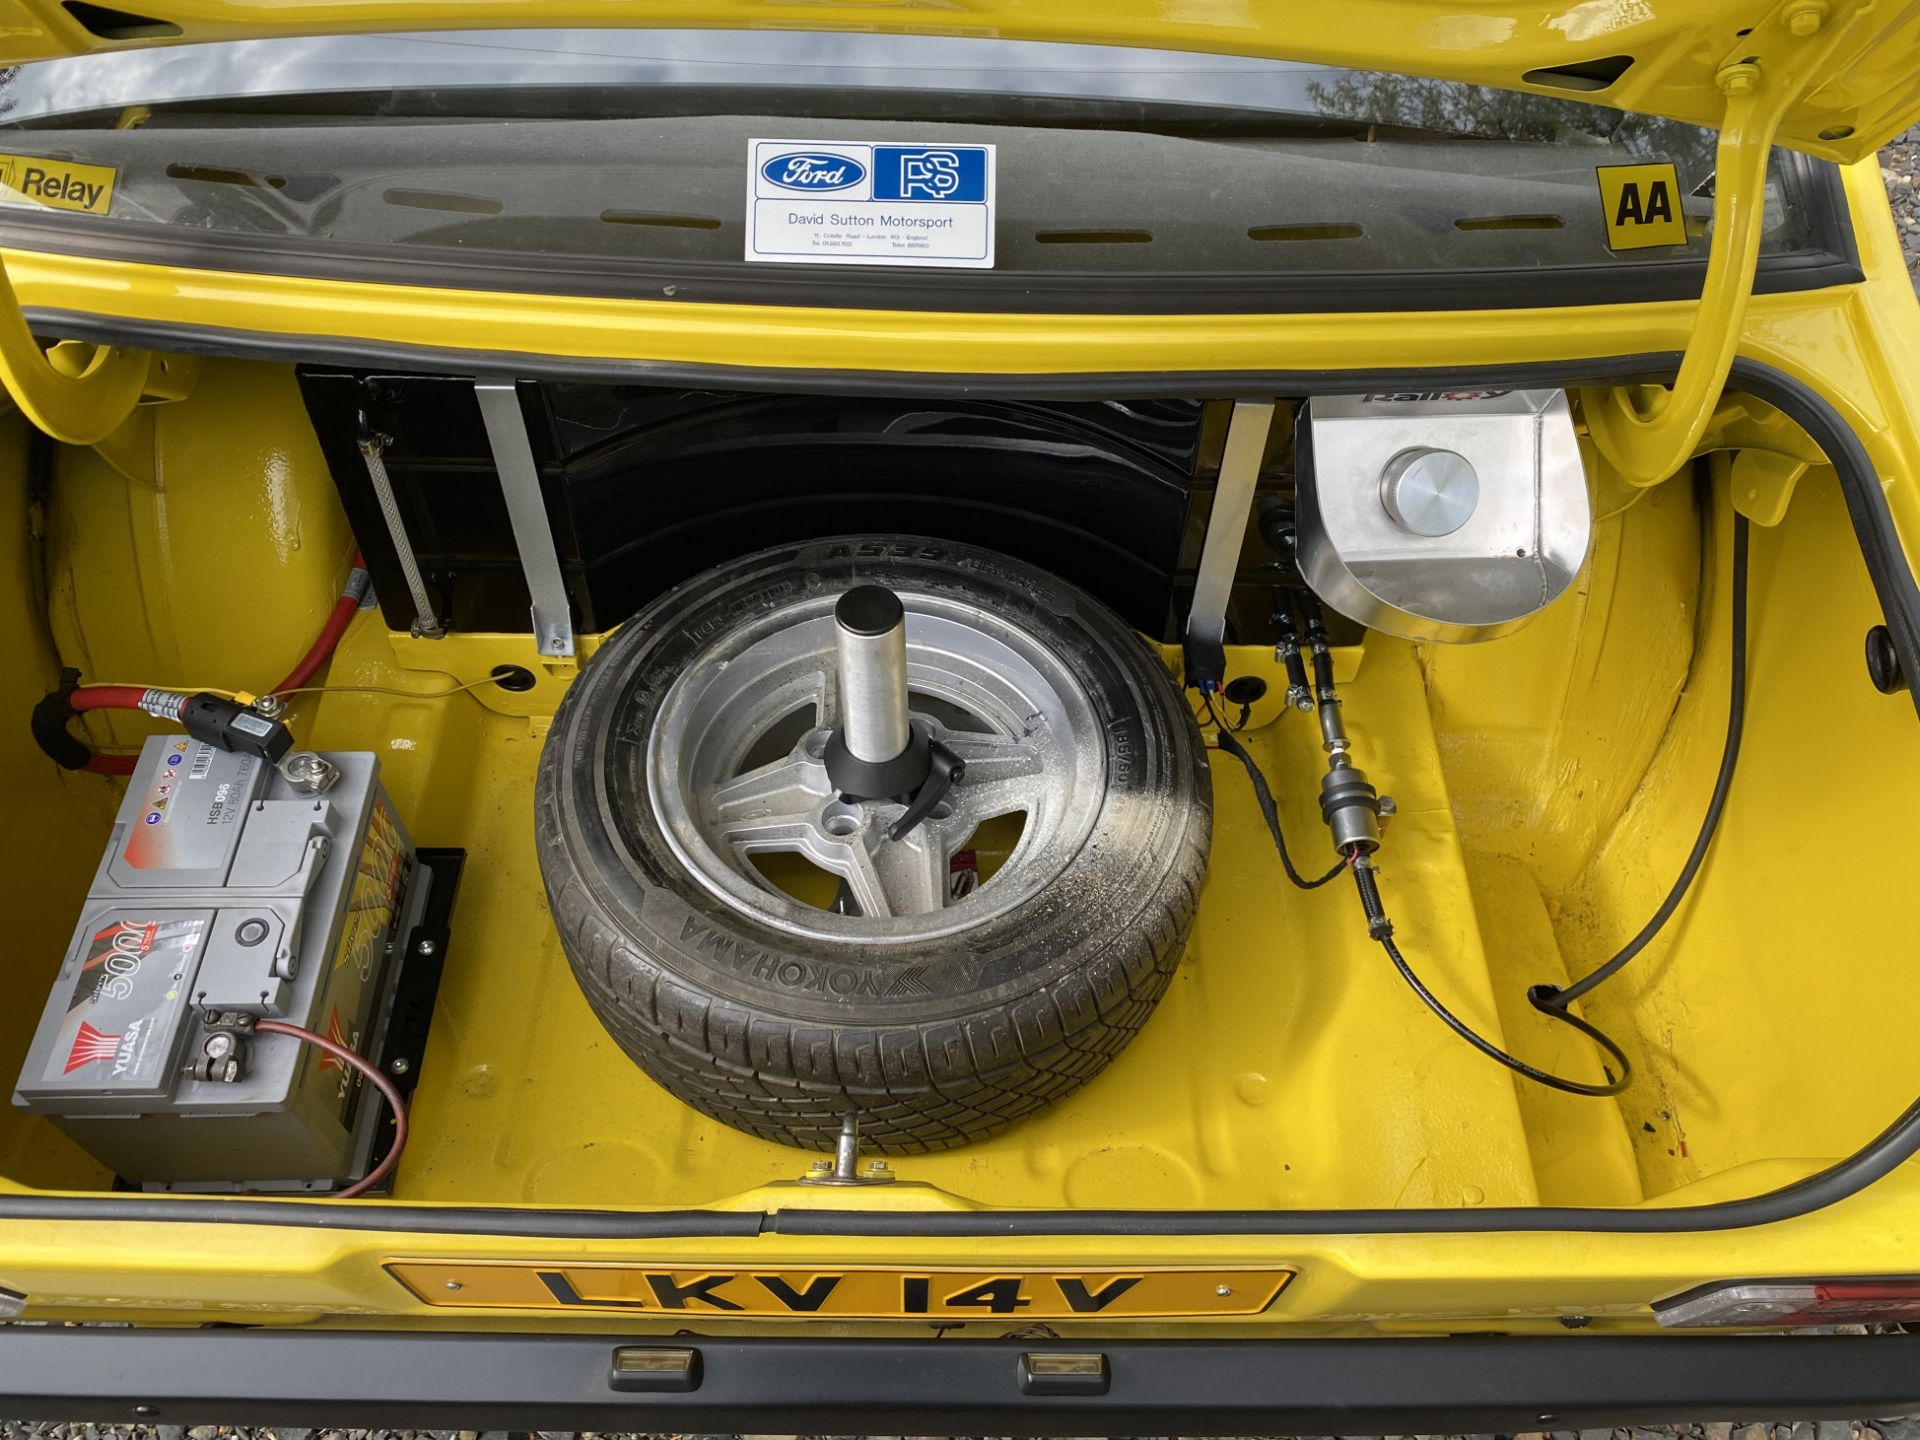 Ford Escort MK2 - Image 49 of 58